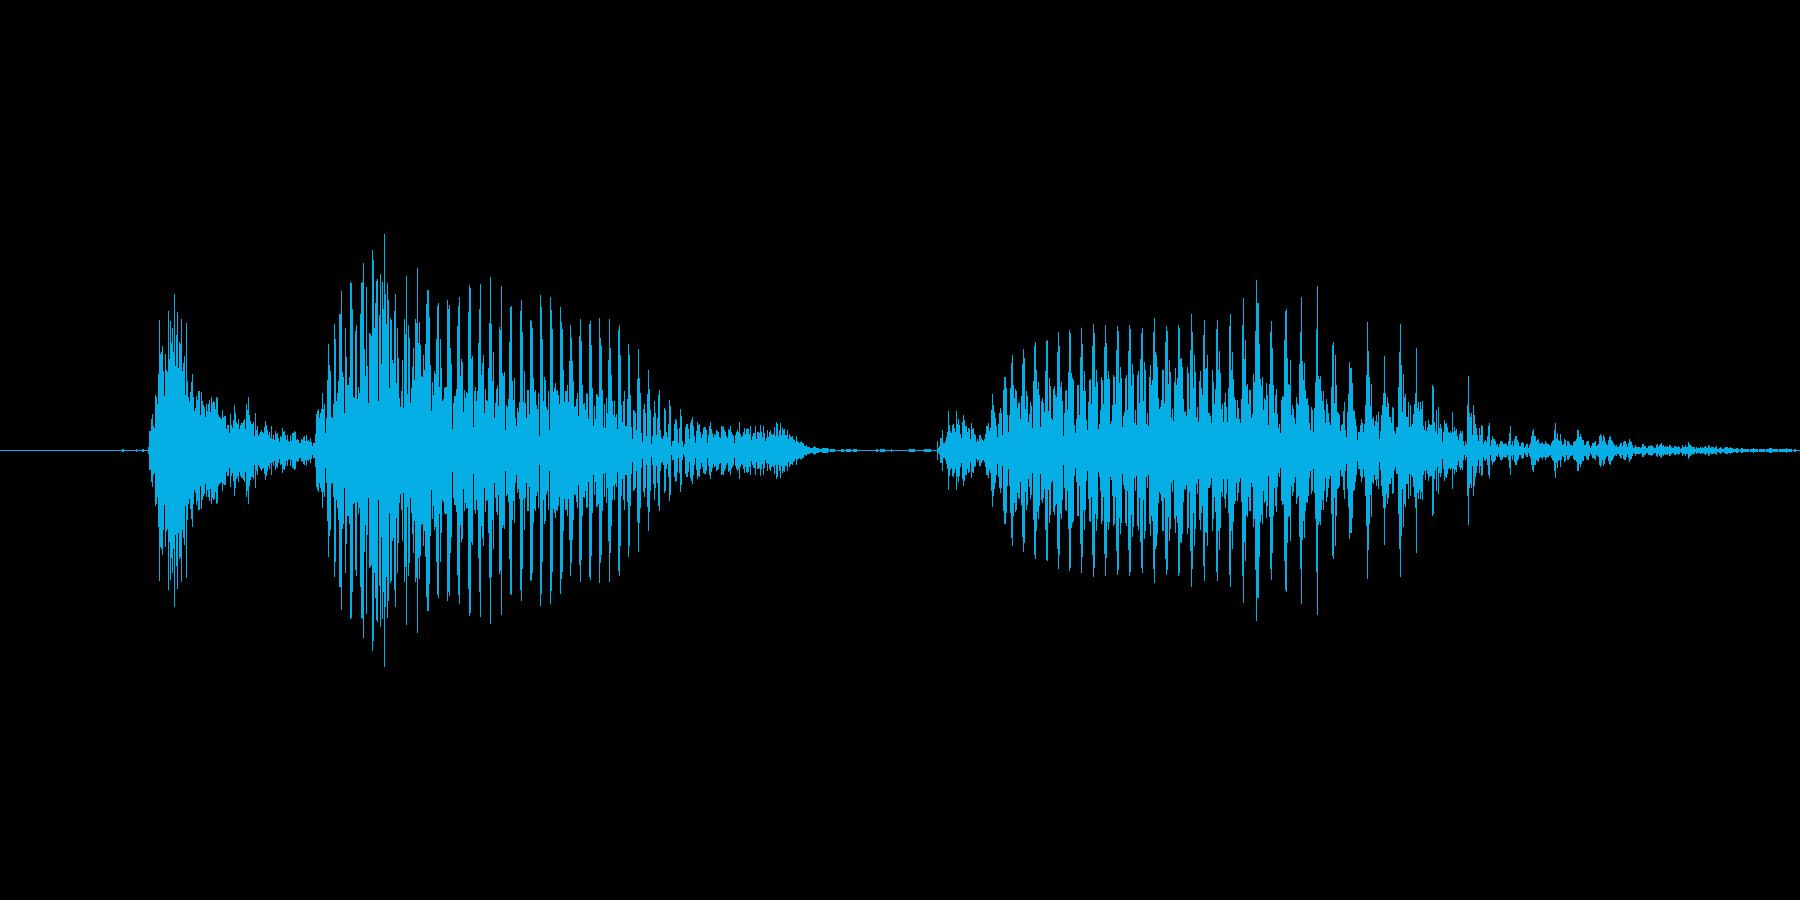 「12 PM」英語発音の再生済みの波形